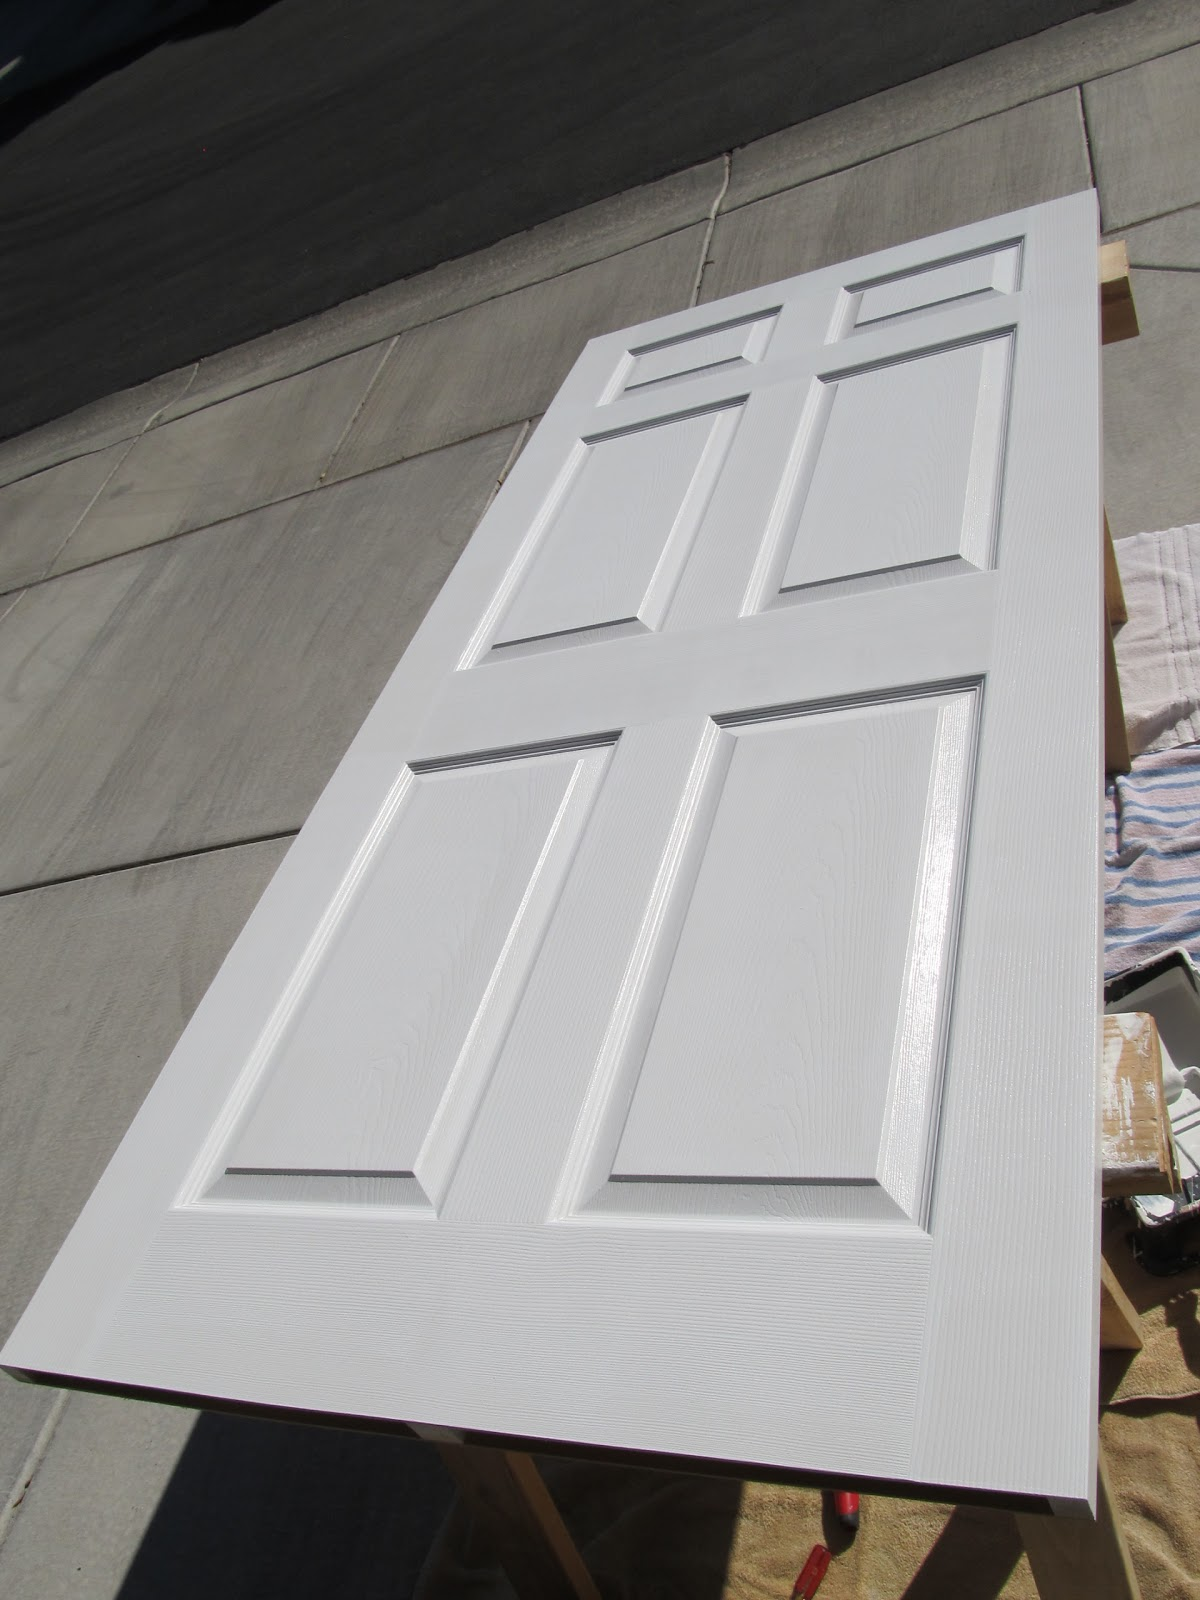 Http Diymamas Blogspot Com 2012 12 How To Paint Door And Get Professional Html